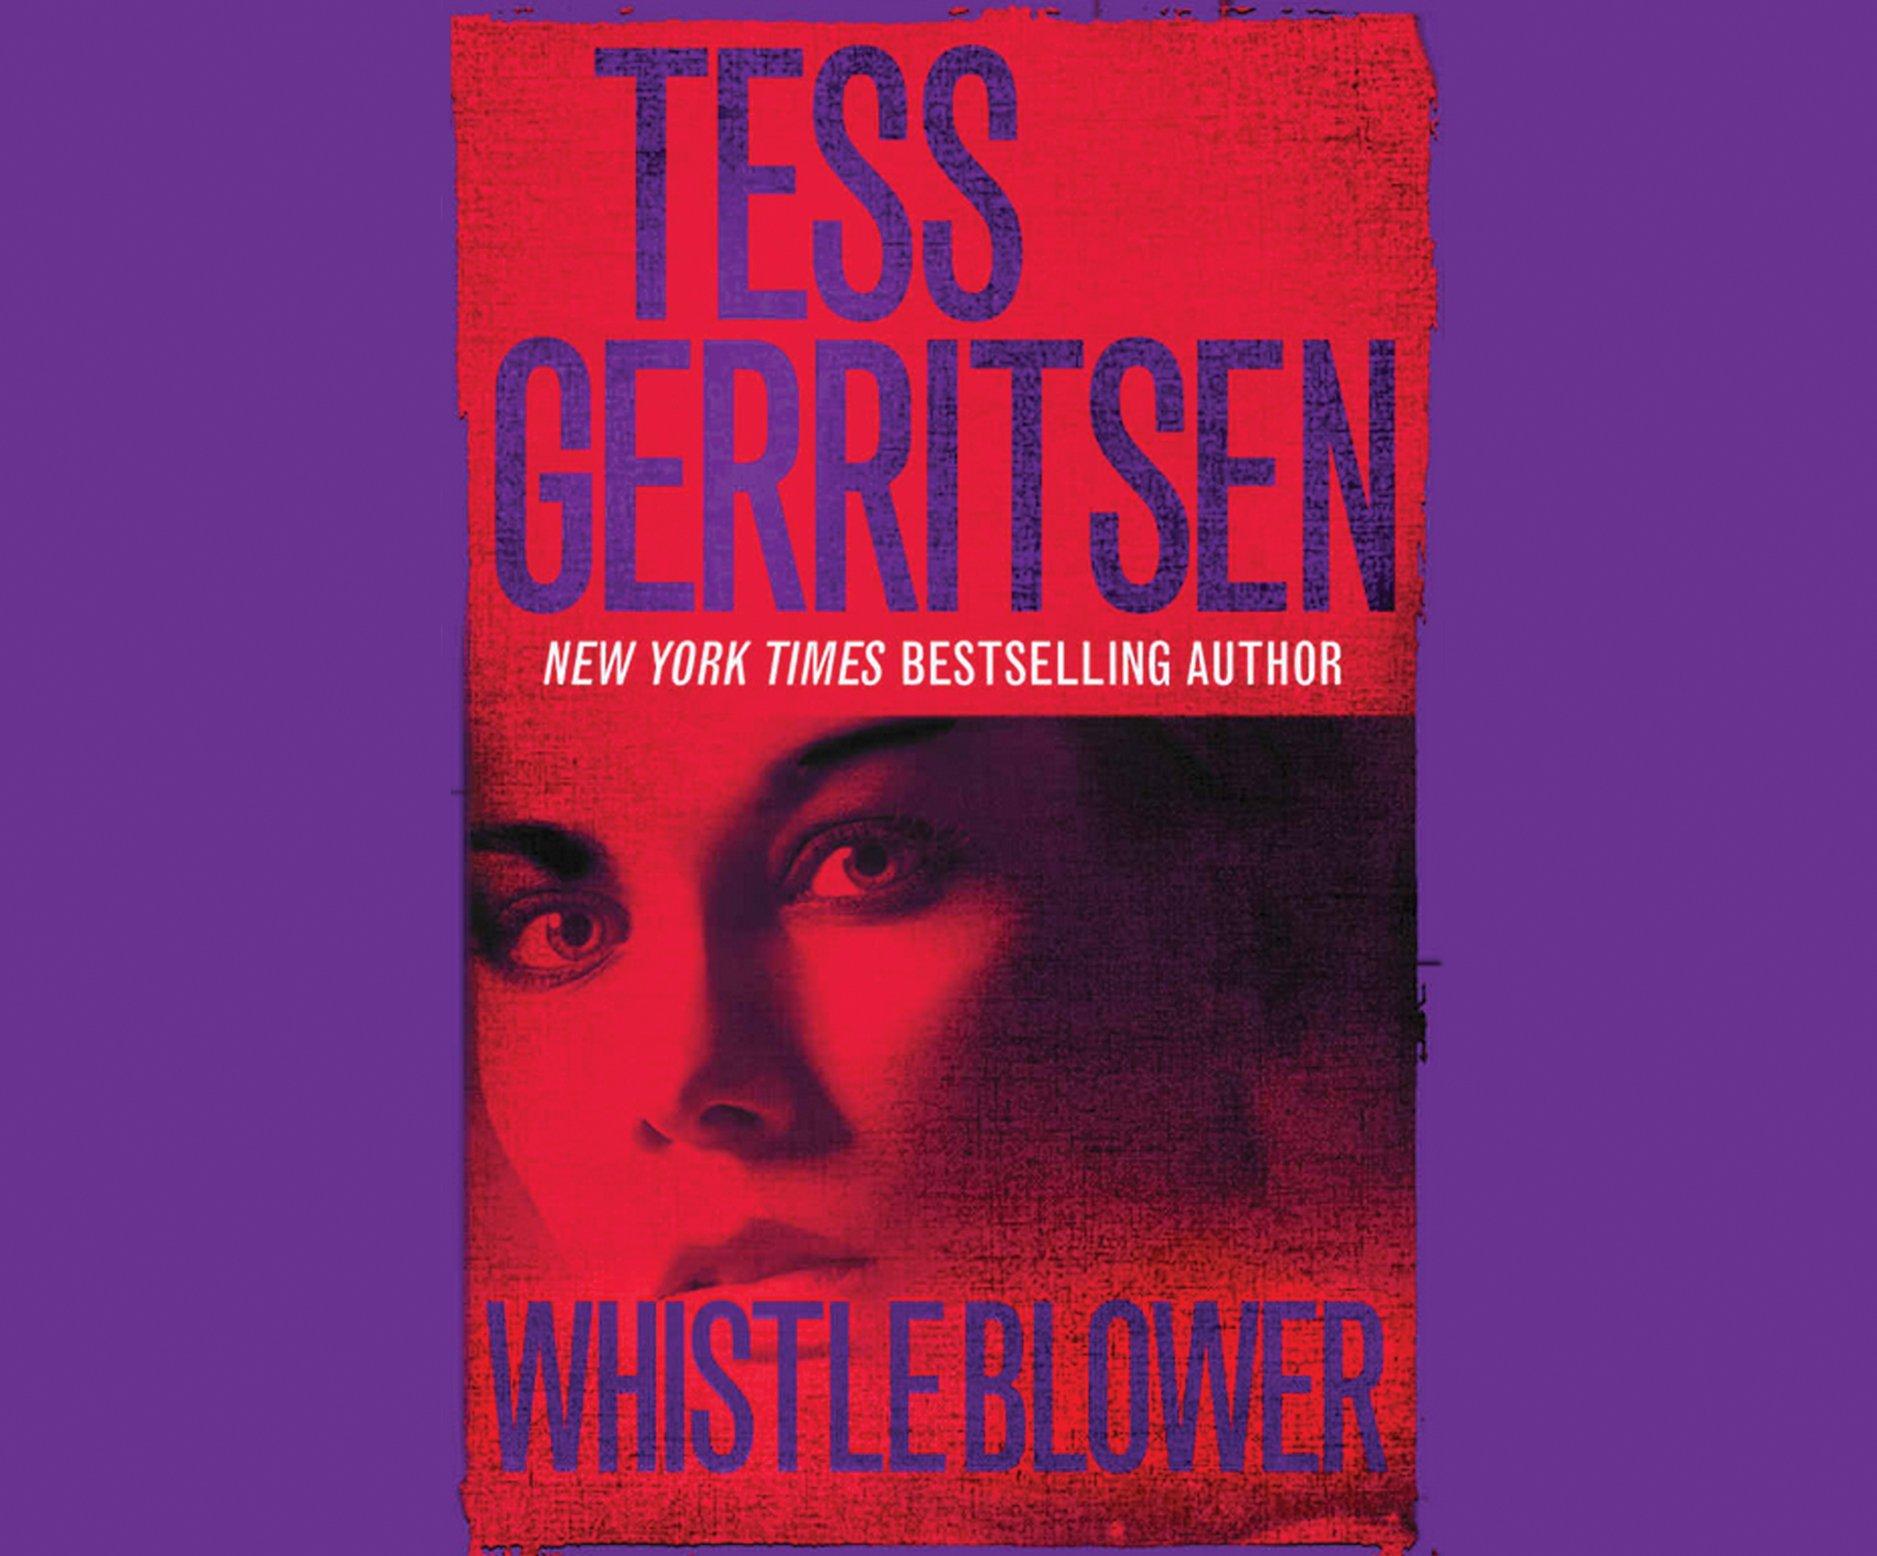 Whistleblower: Tess Gerritsen, Erin Yuen: 9781681414362: Amazon.com: Books  Presumed Guilty Tess Gerritsen